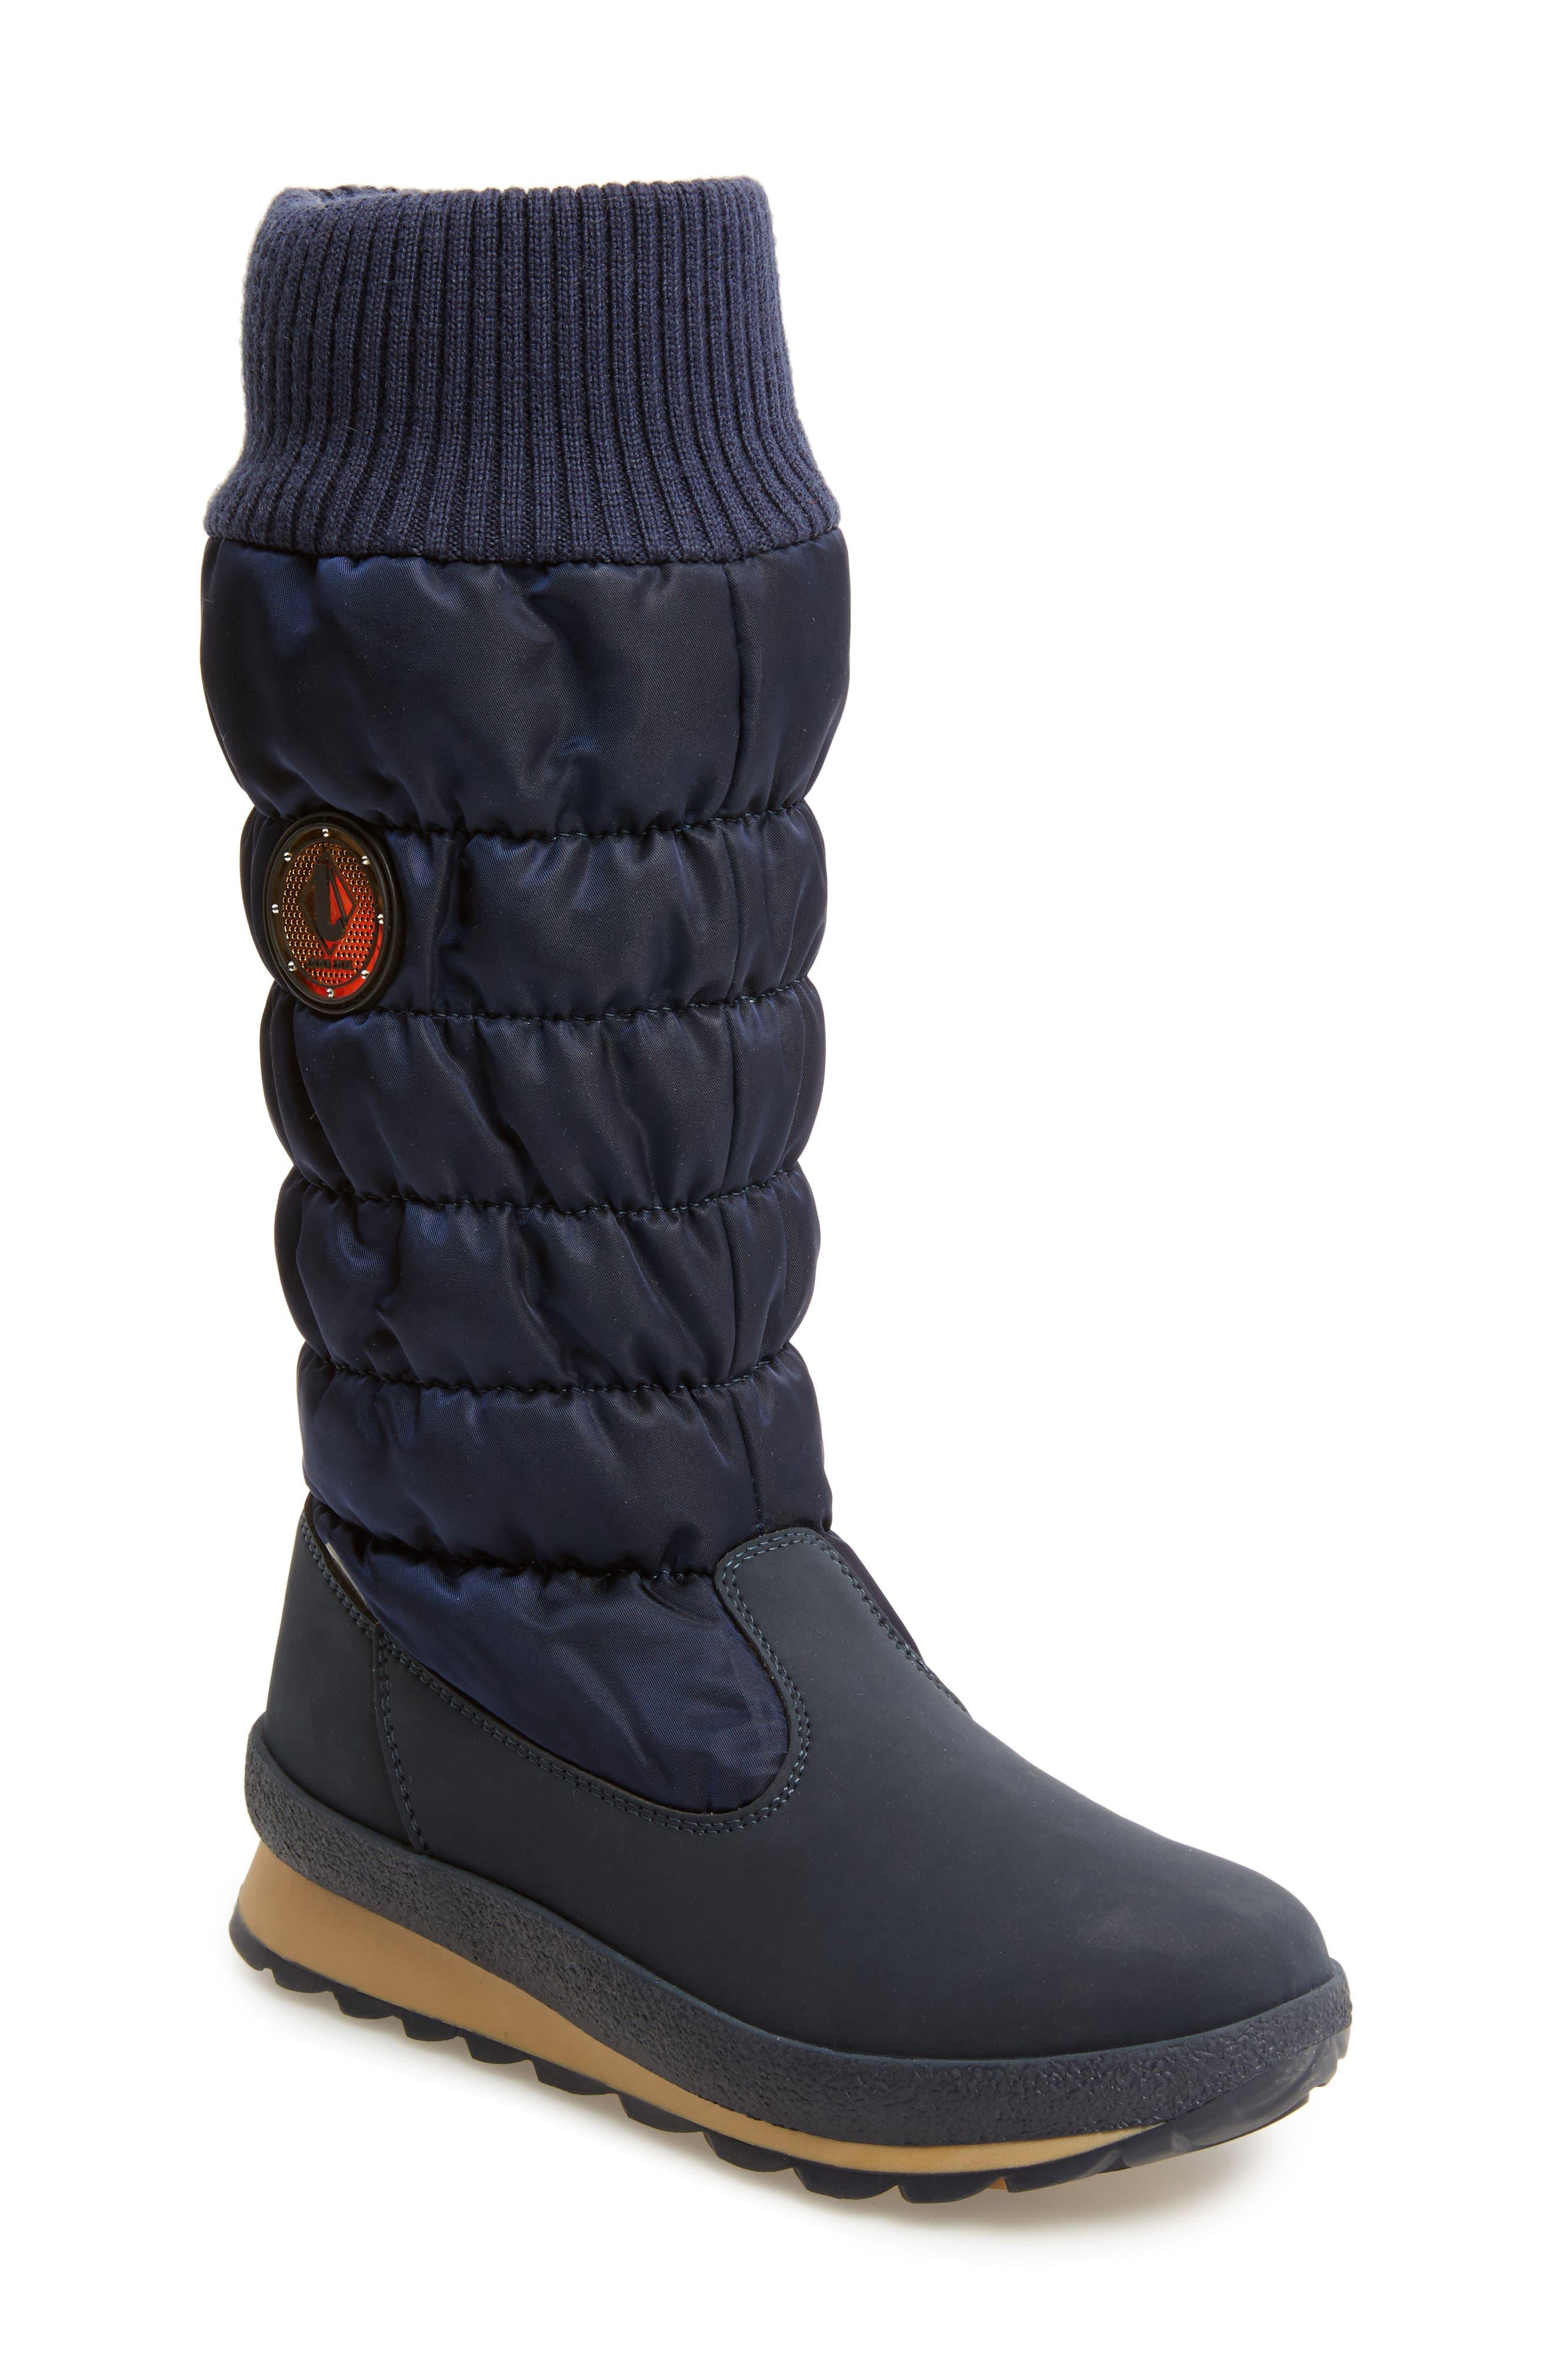 Alternate Image 1 Selected - JOG DOG St. Anton Waterproof Winter Boot (Women)